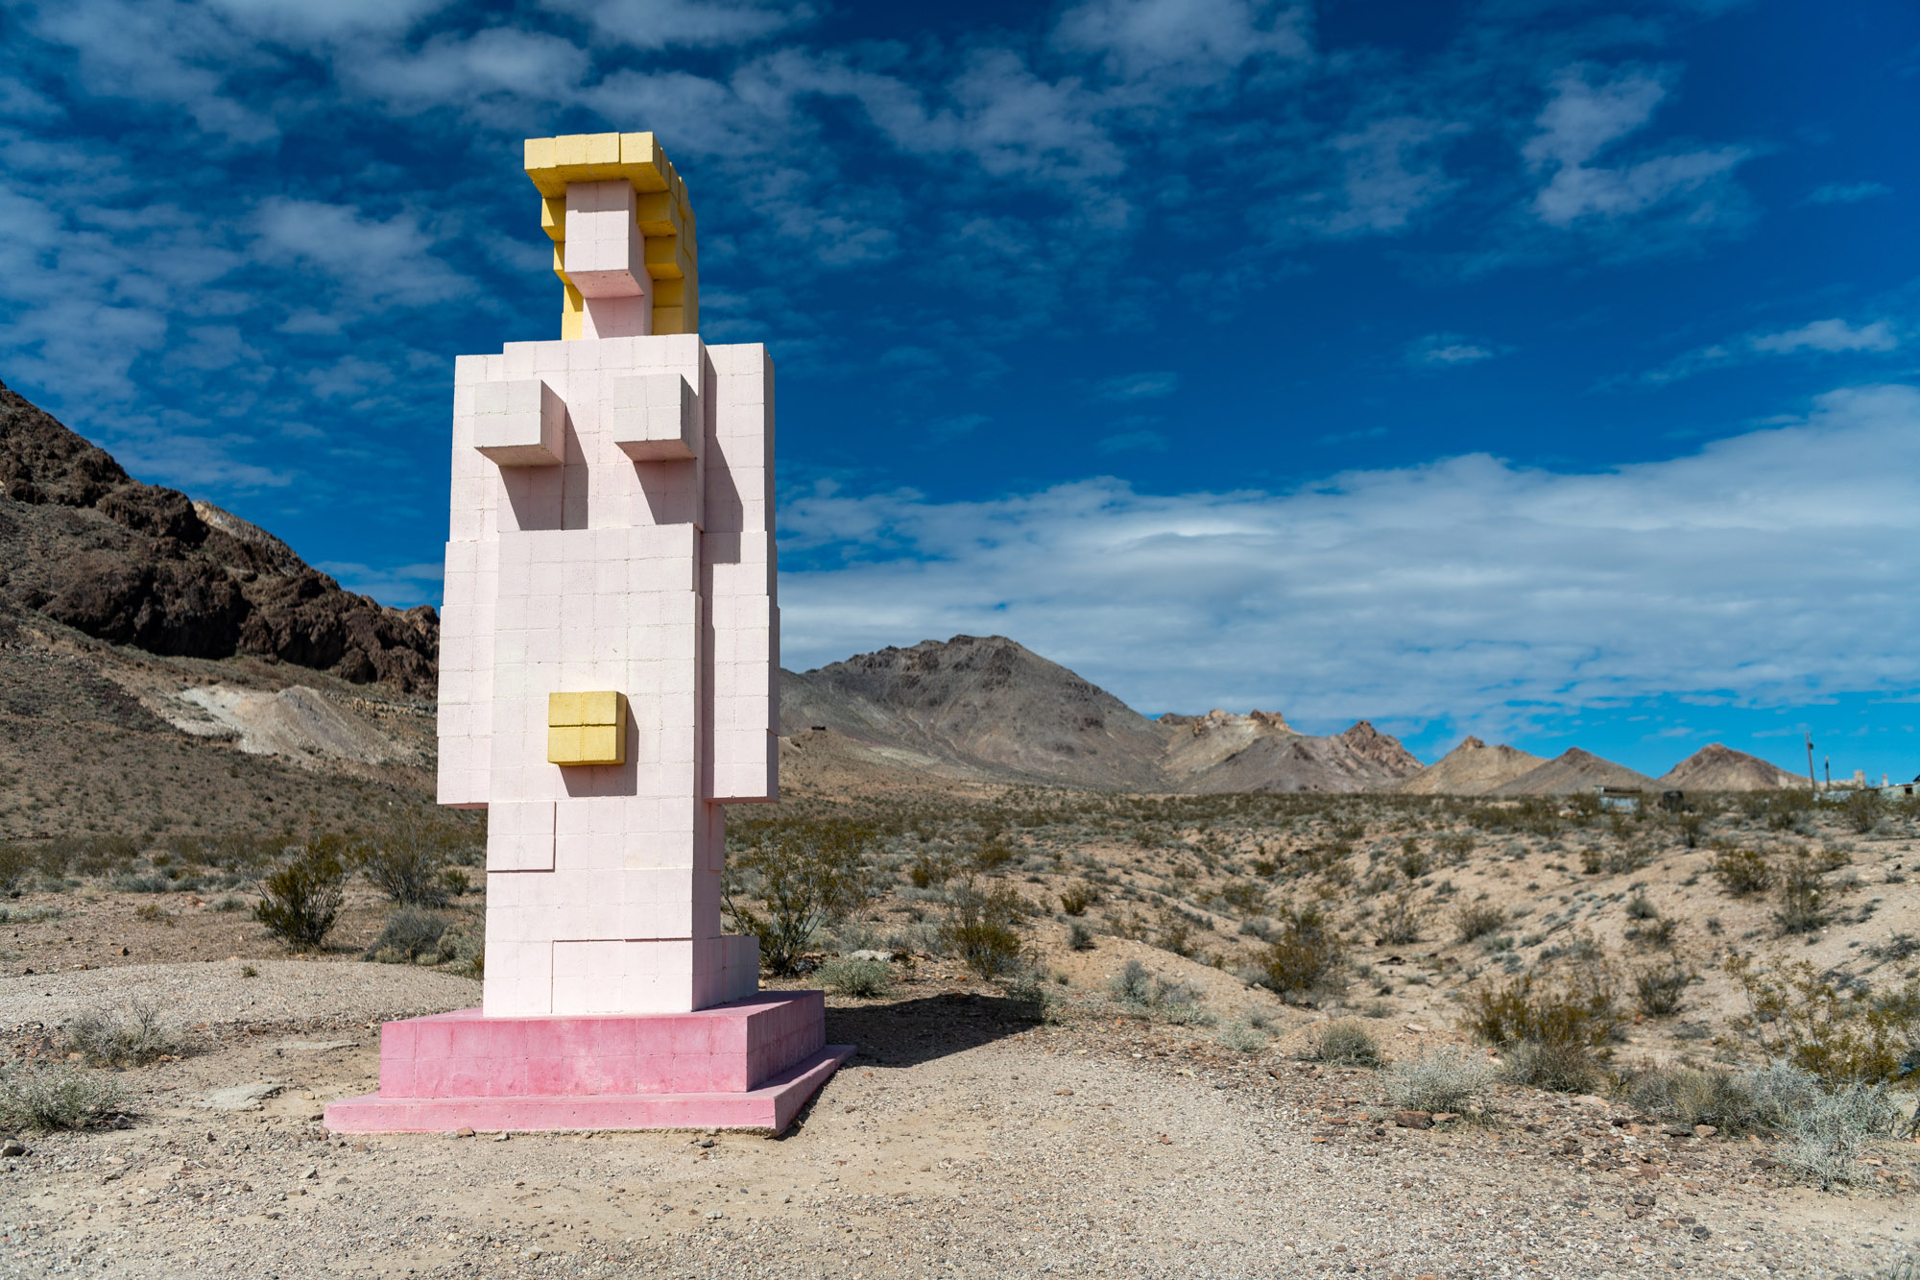 Lady Desert - The Venus of Nevada